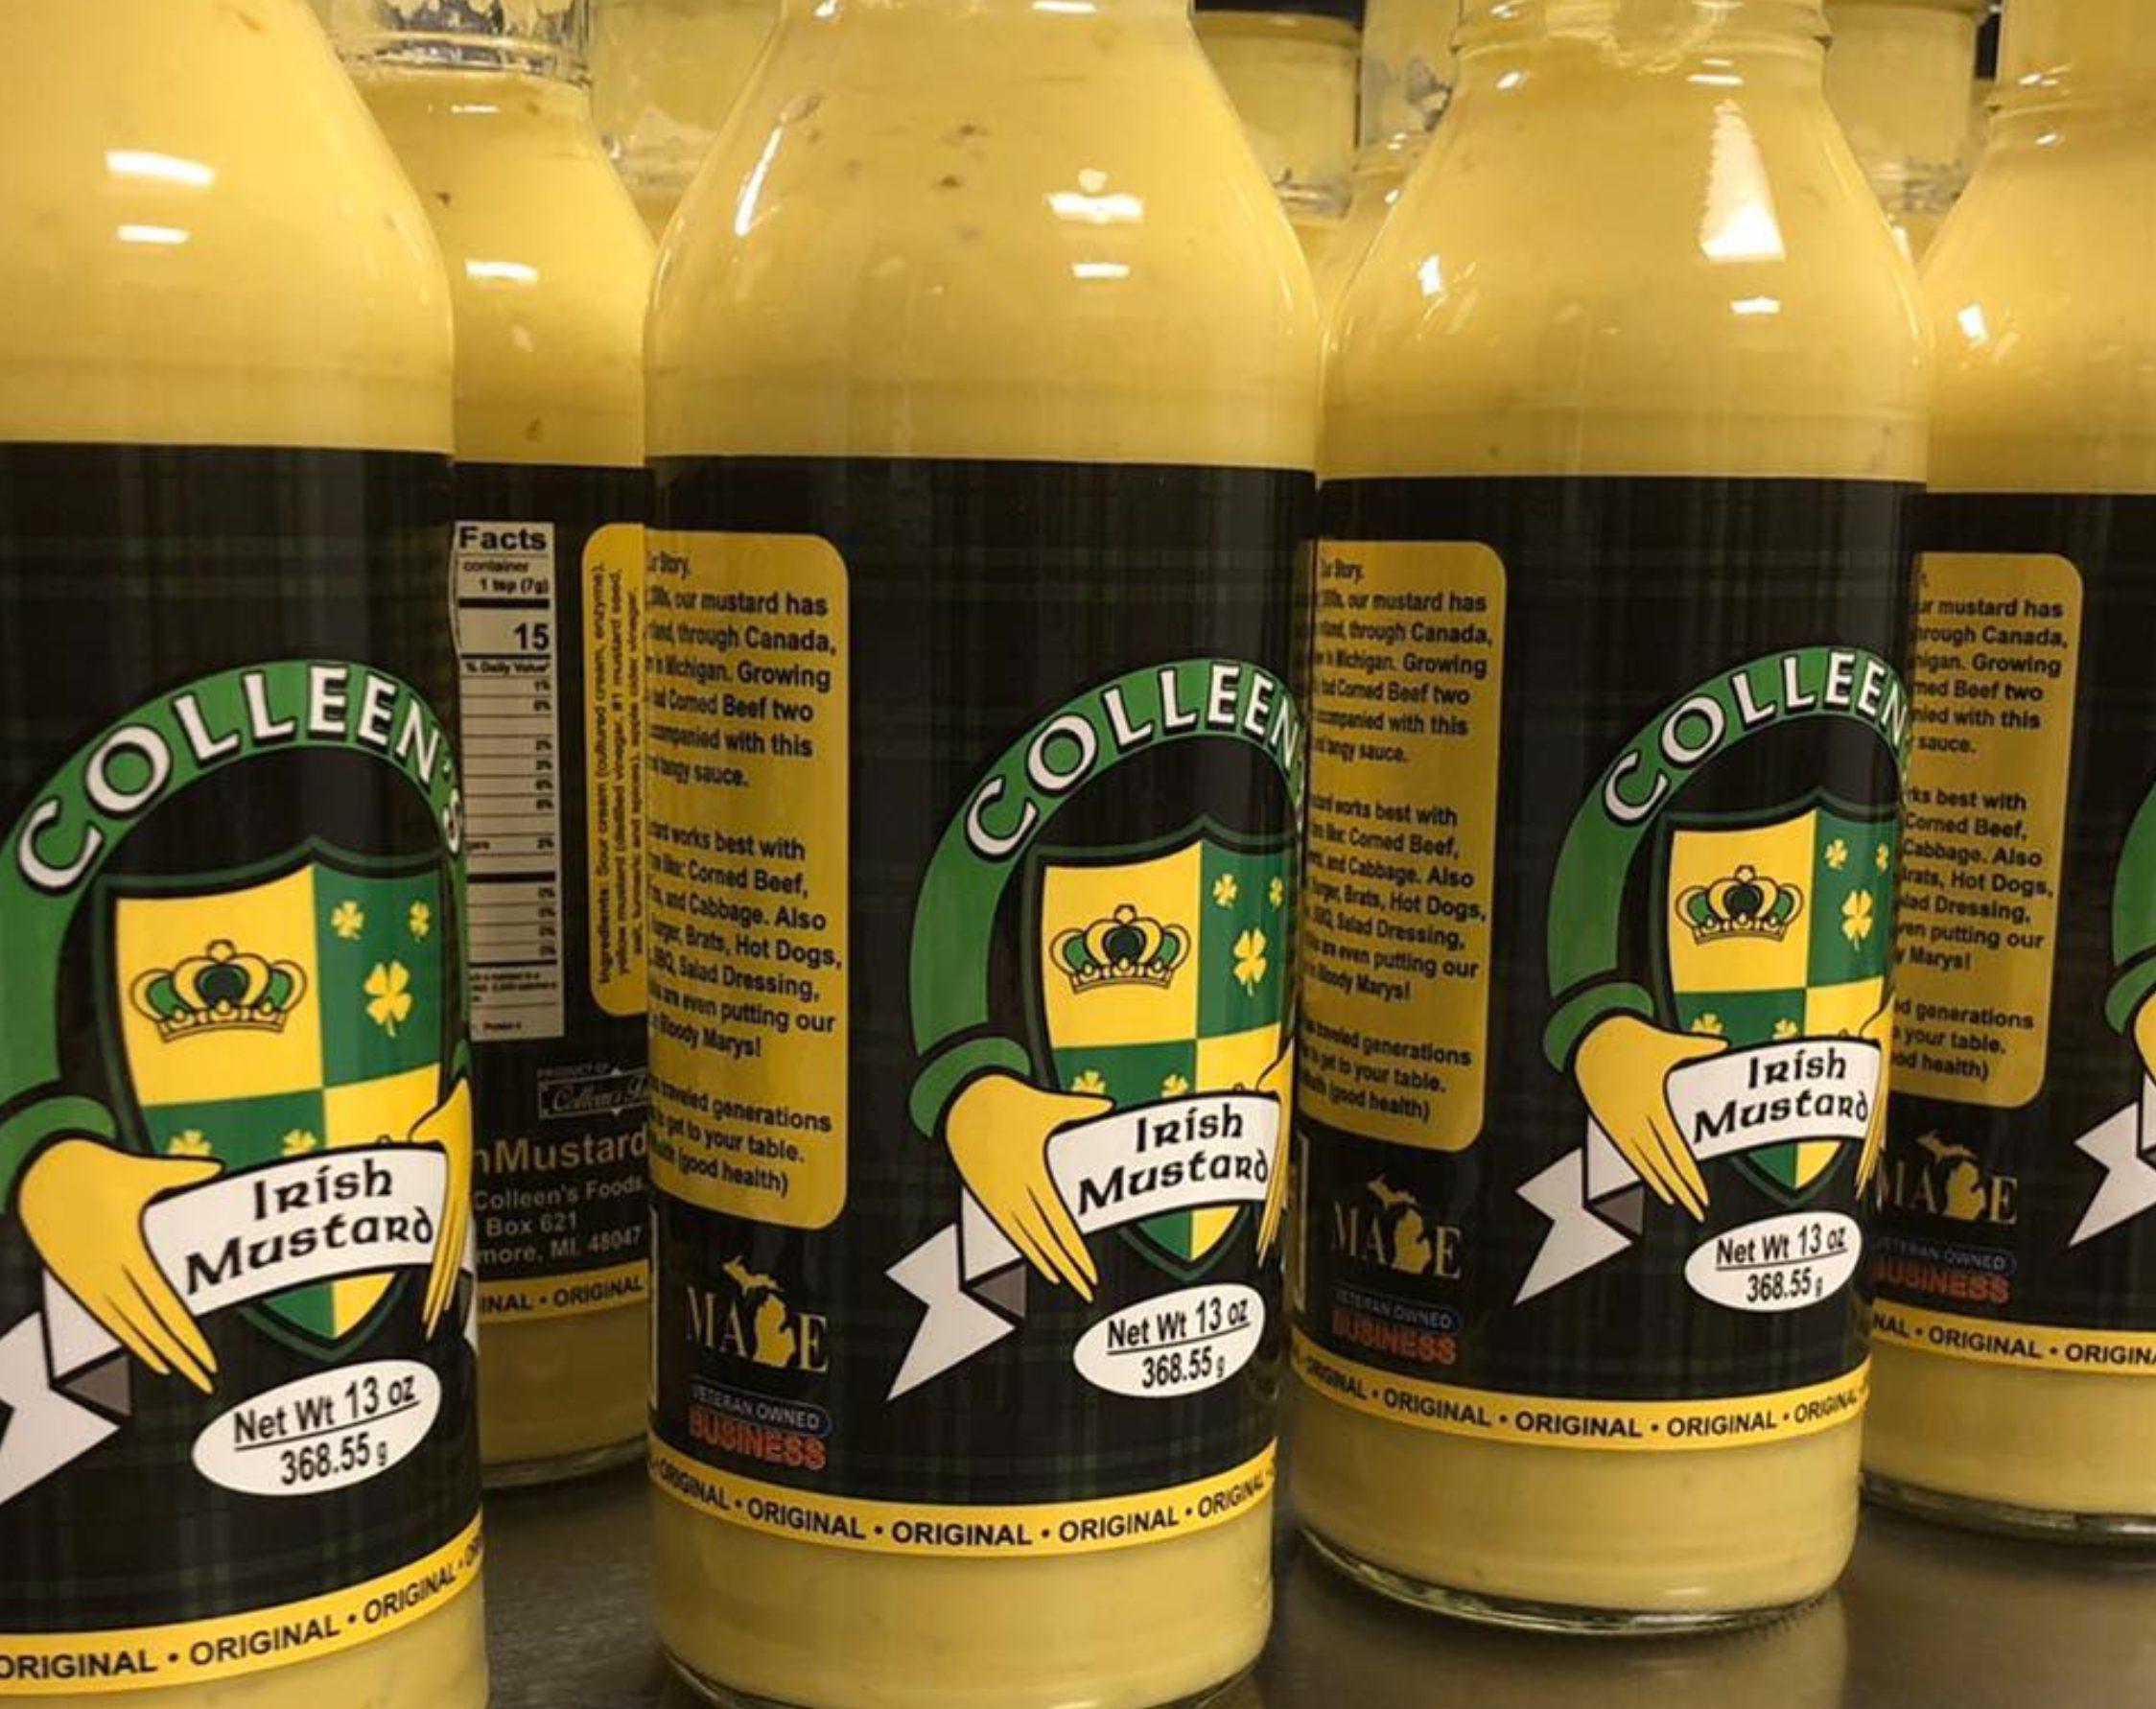 Colleens Irish Mustard - Mustard Label 01